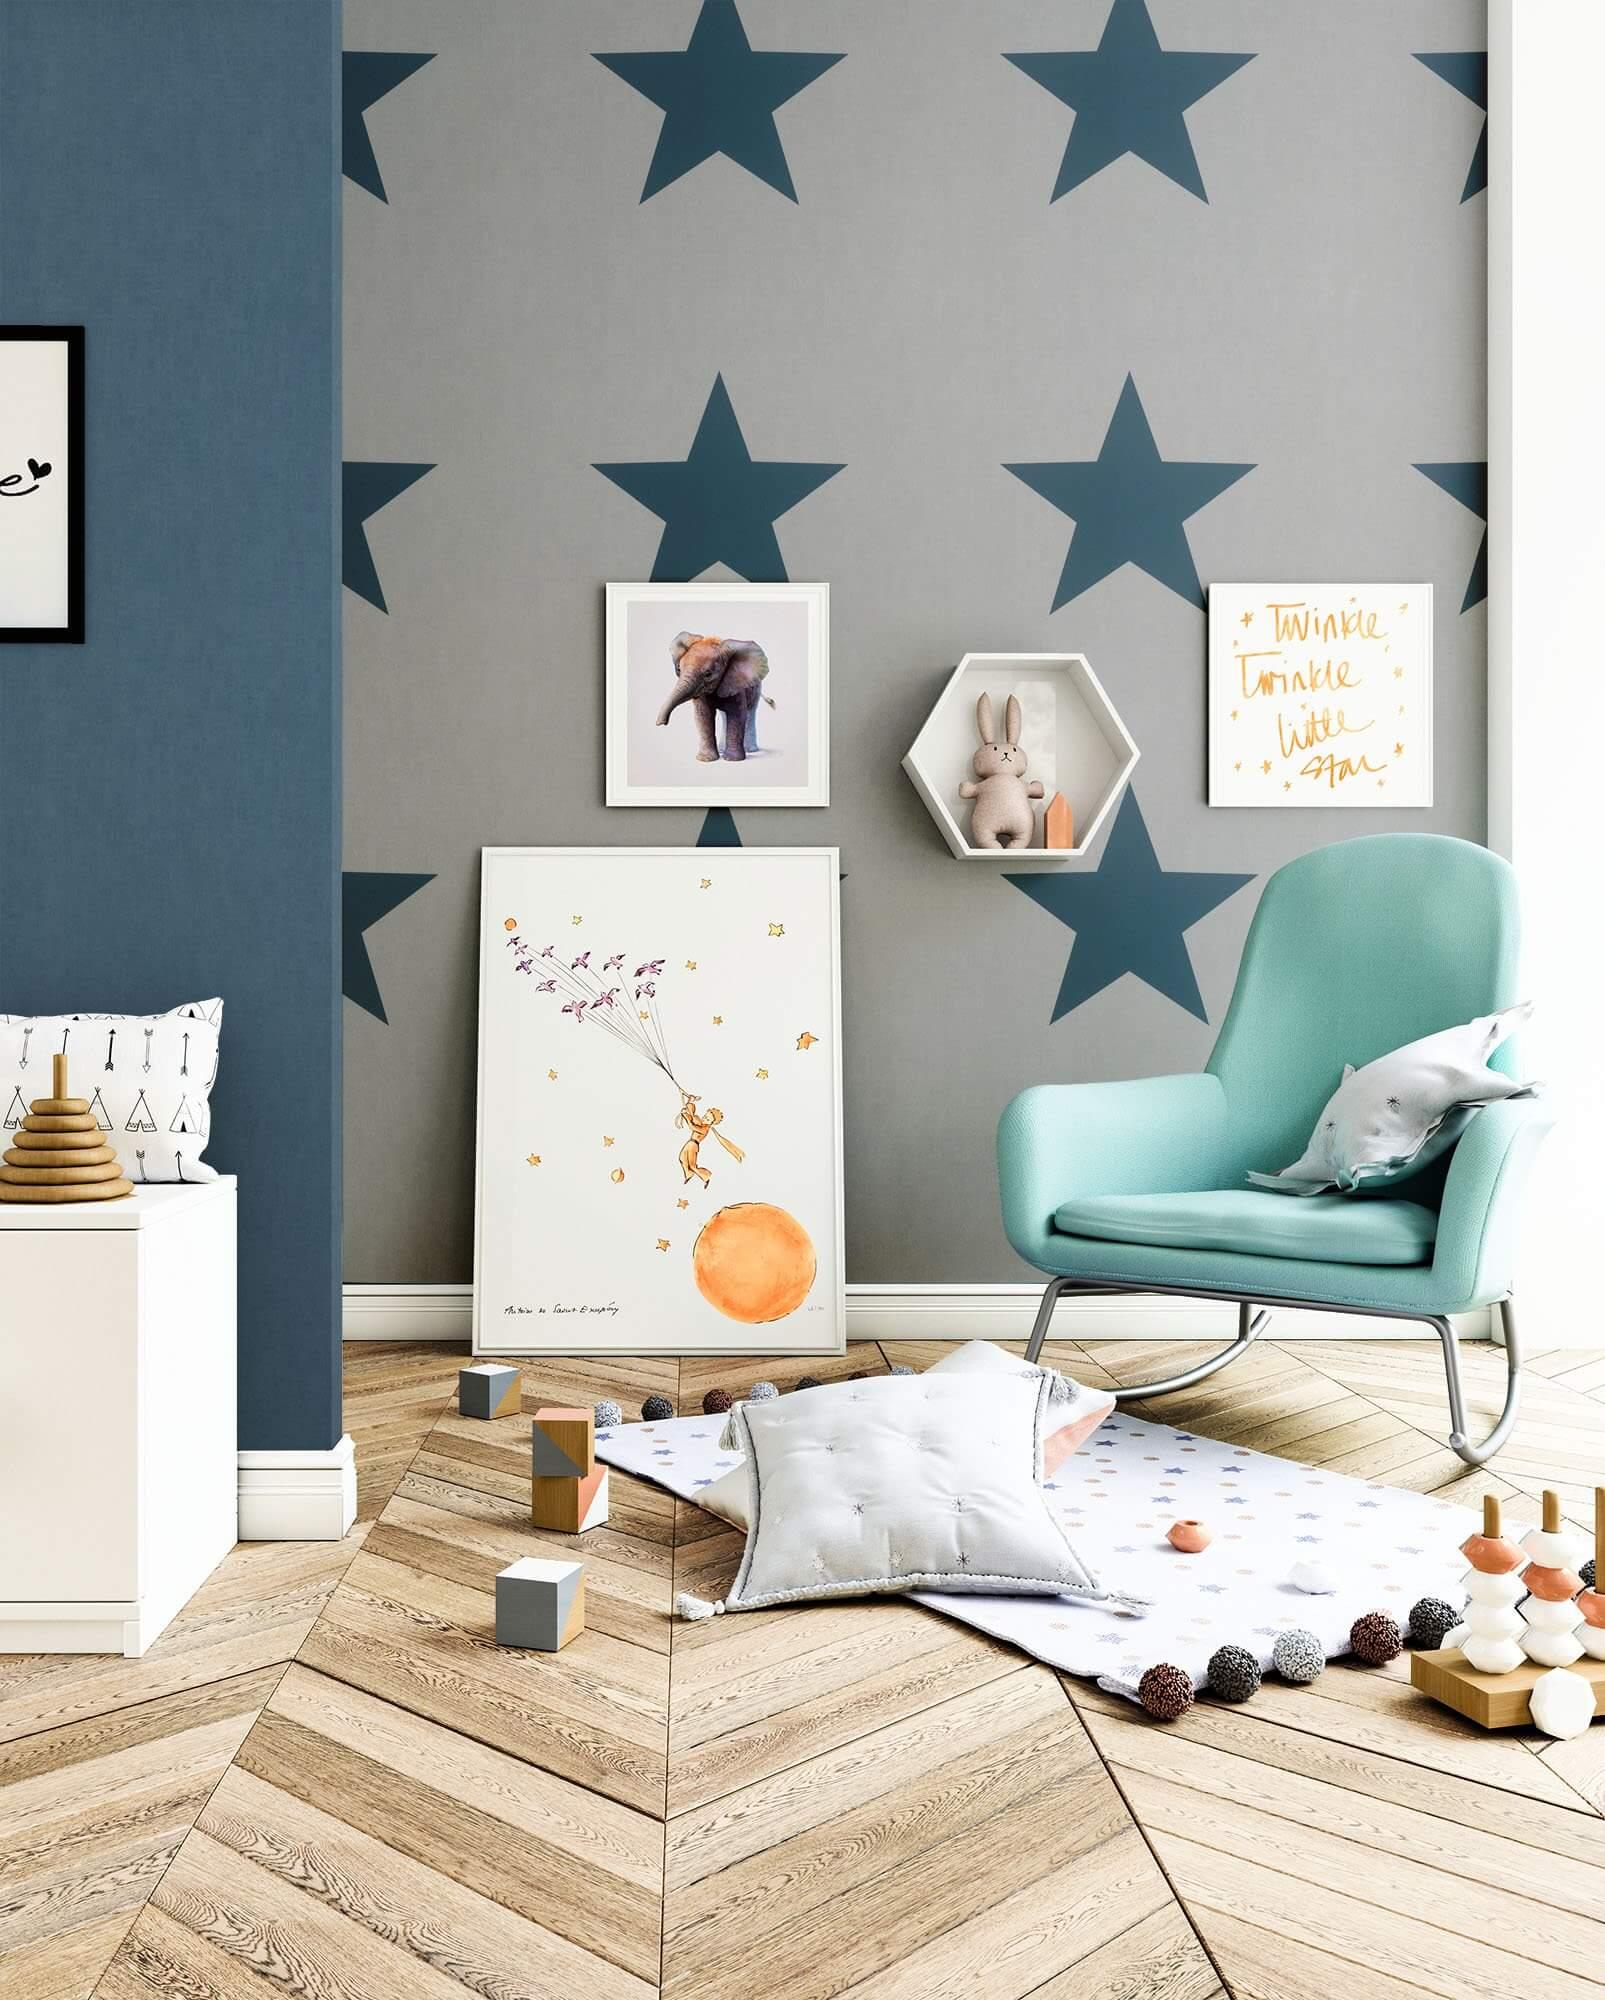 papiertapete grau modern sterne wohnen kinder newroom. Black Bedroom Furniture Sets. Home Design Ideas